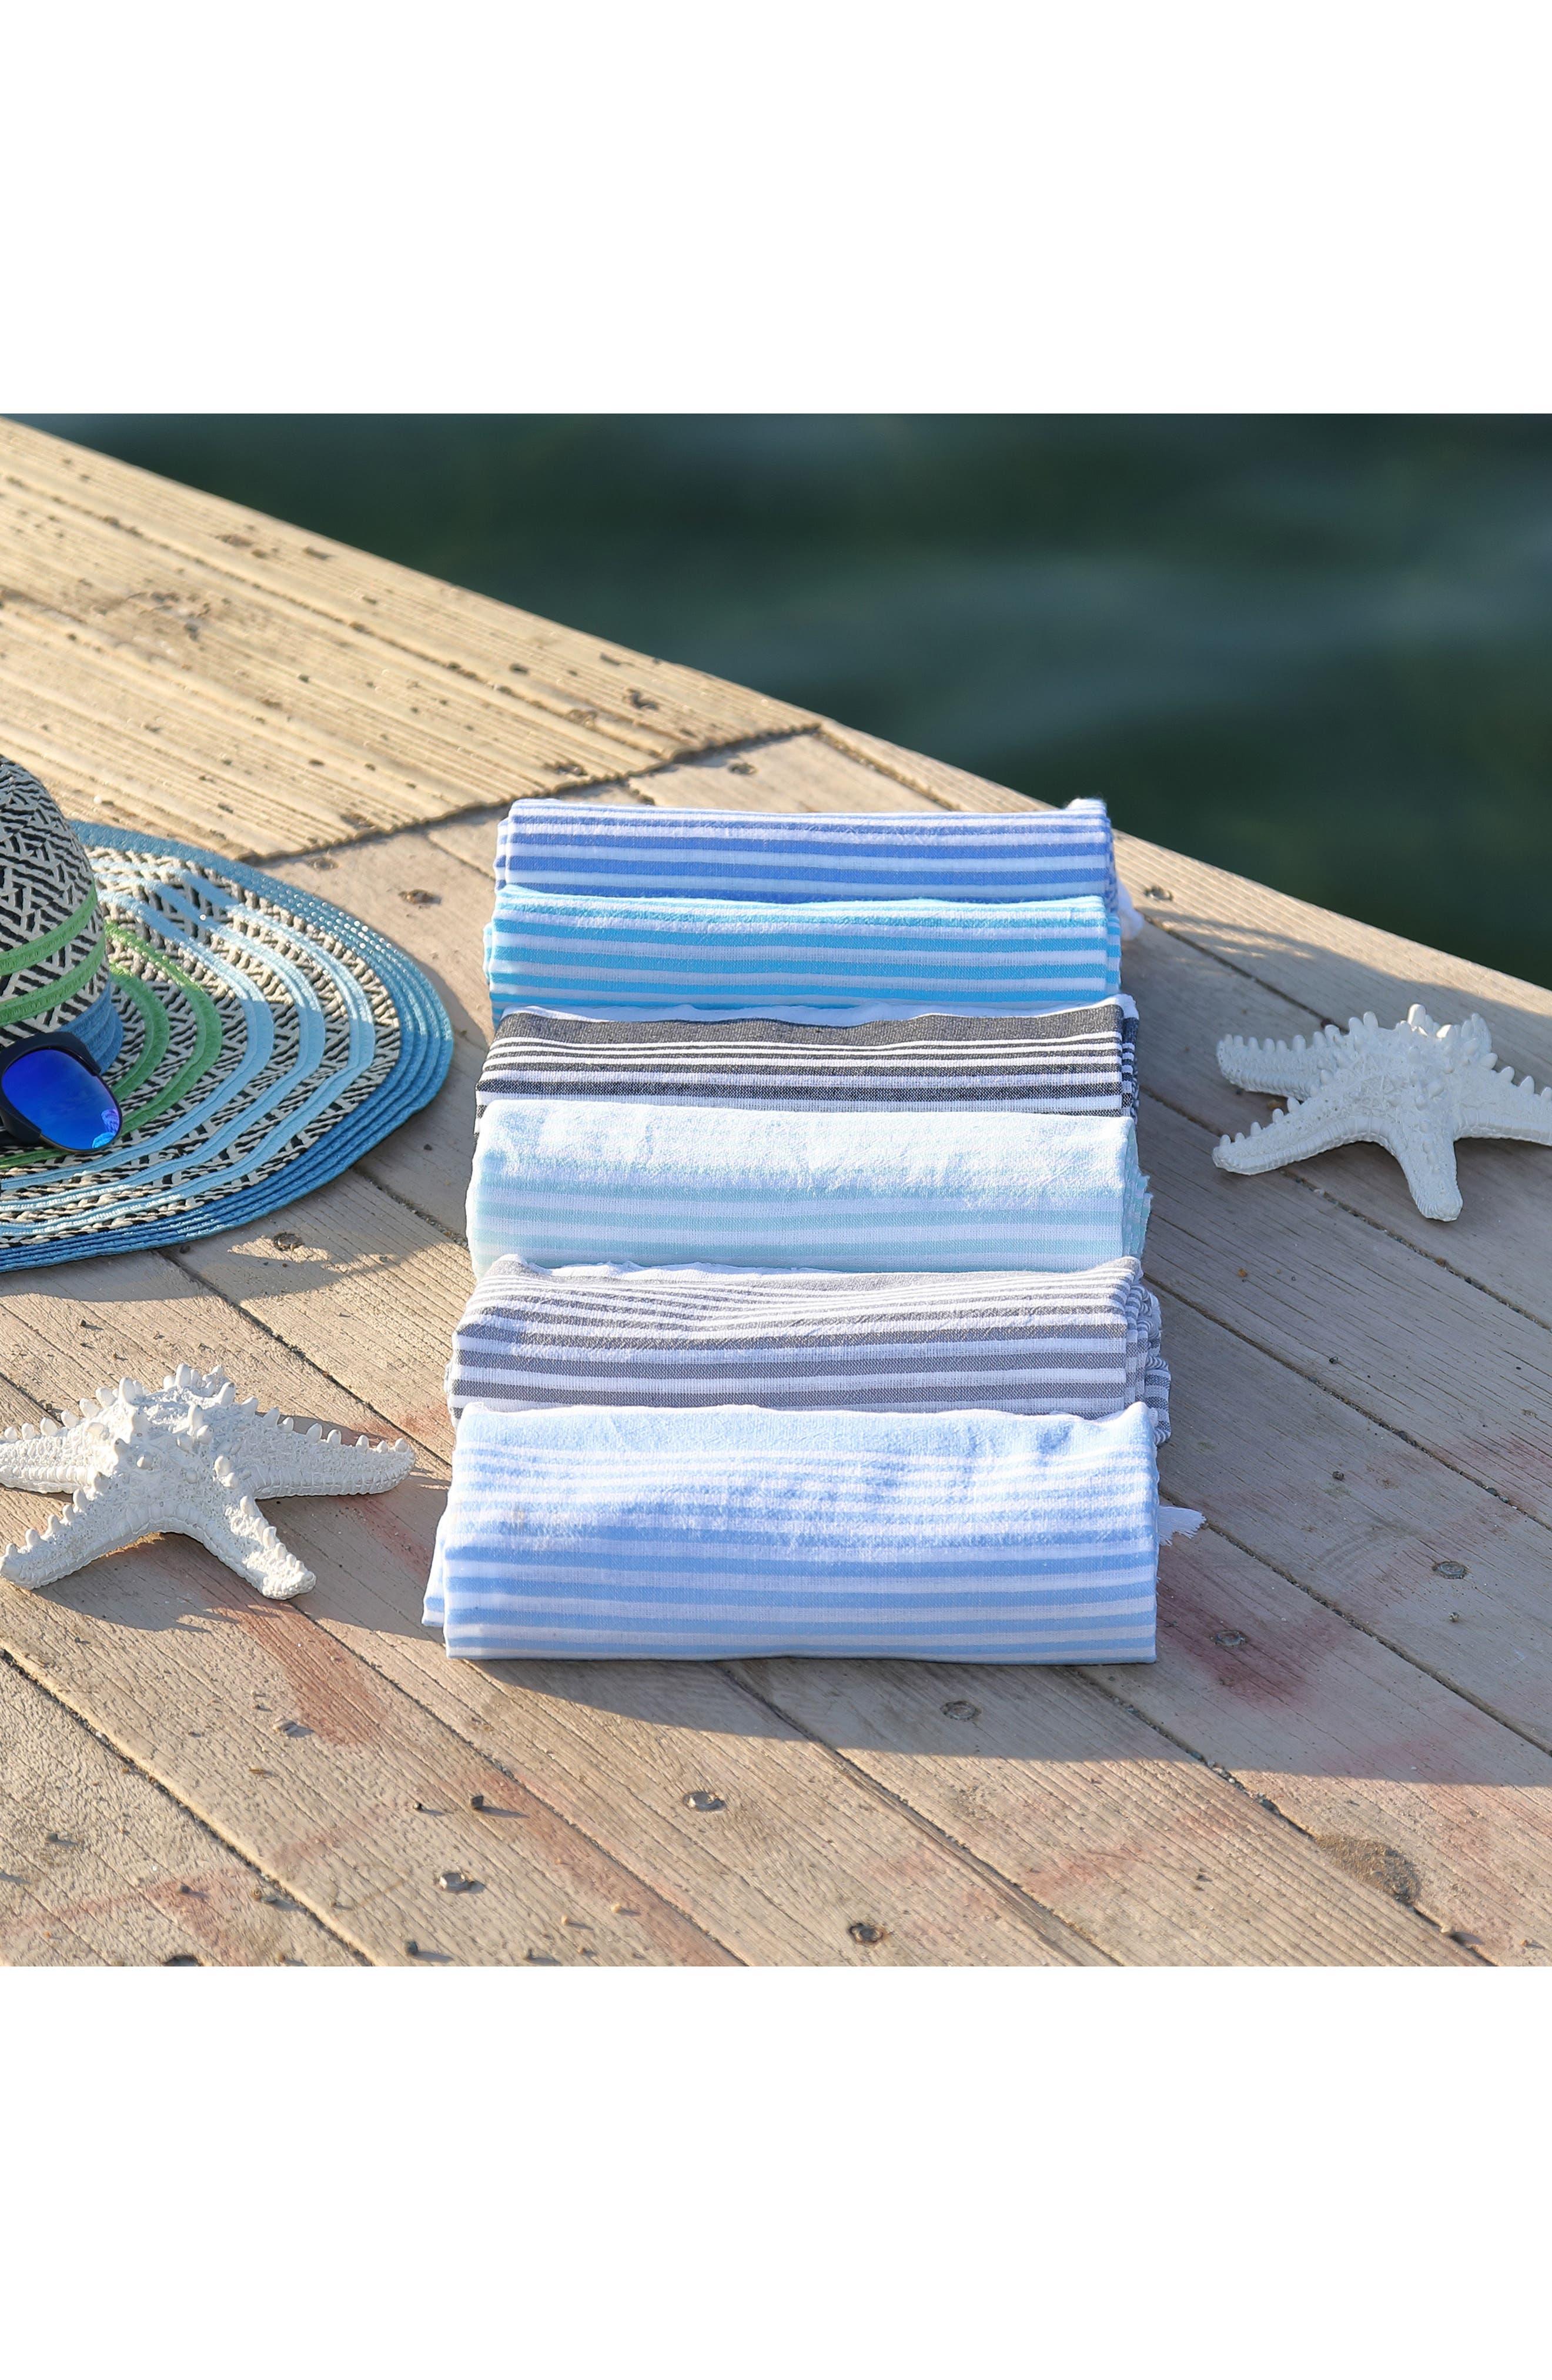 Soft Stripes Turkish Pestemal Towel,                             Alternate thumbnail 9, color,                             BLACK